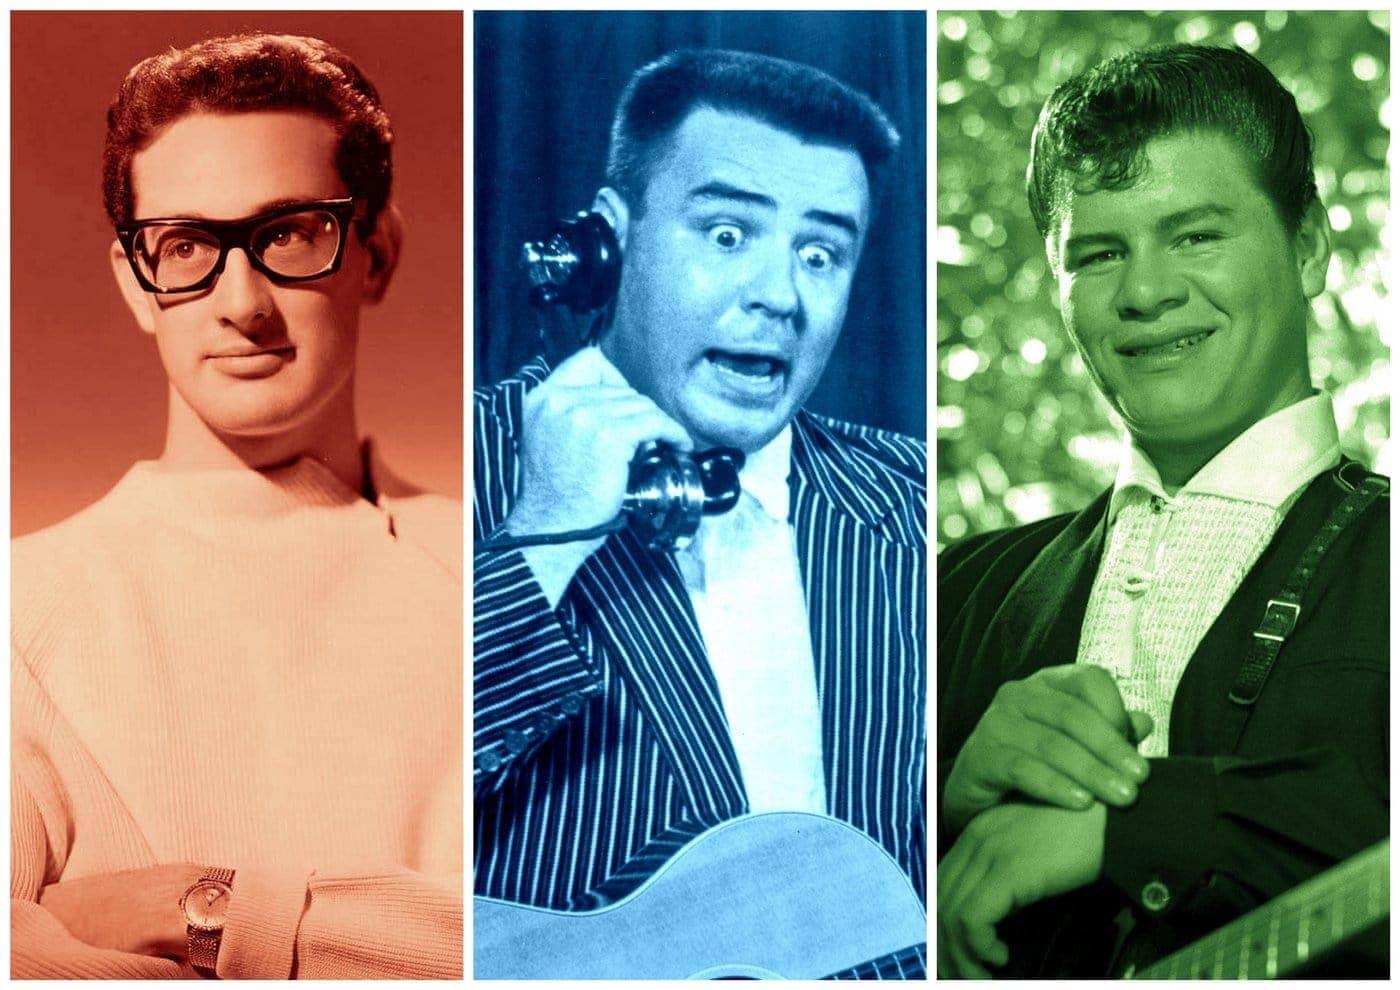 Buddy Holly, Ritchie Valens Big Bopper killed in plane crash (1959)